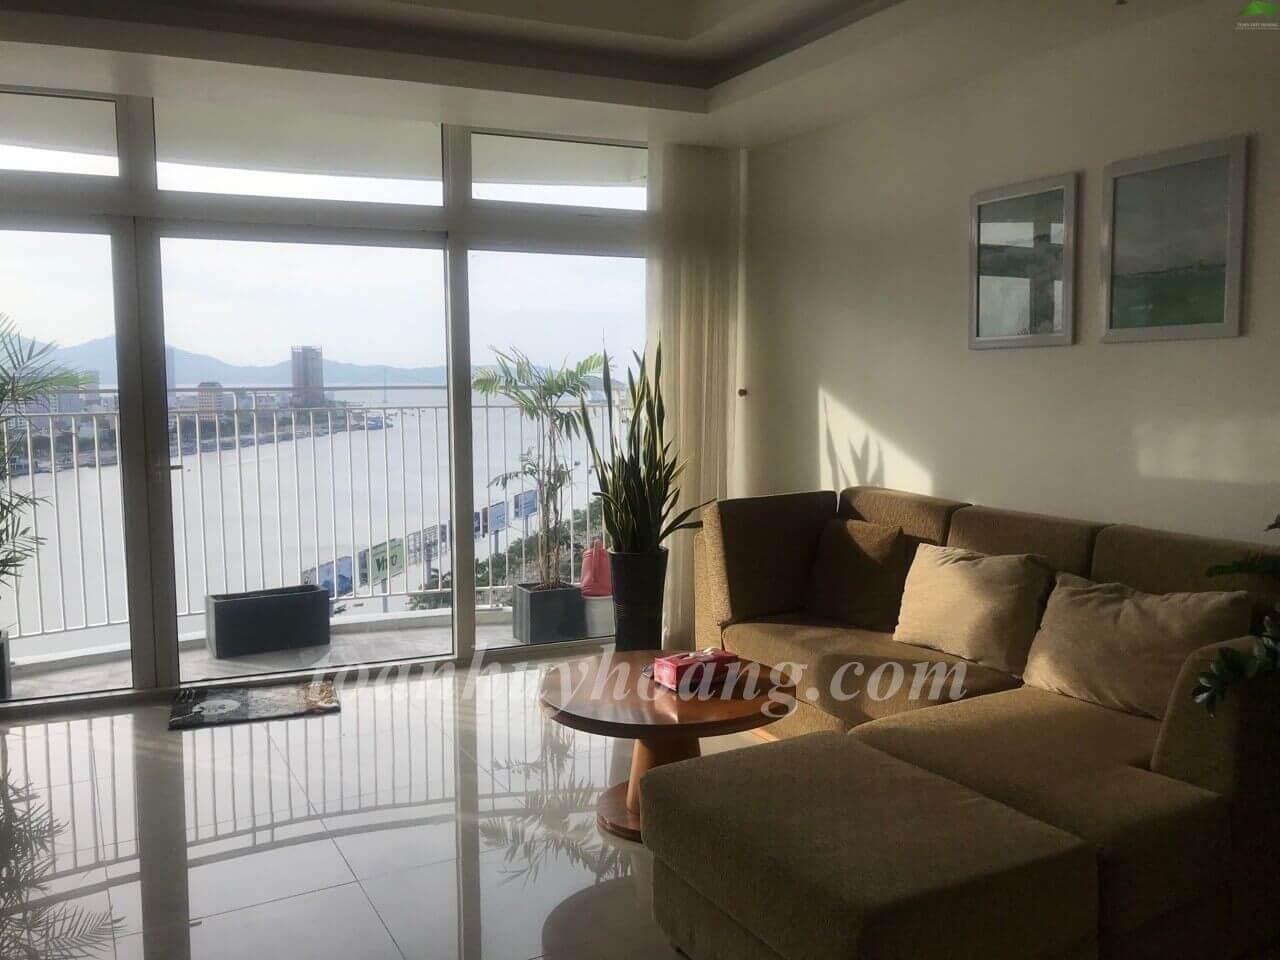 Residence apartments Da Nang